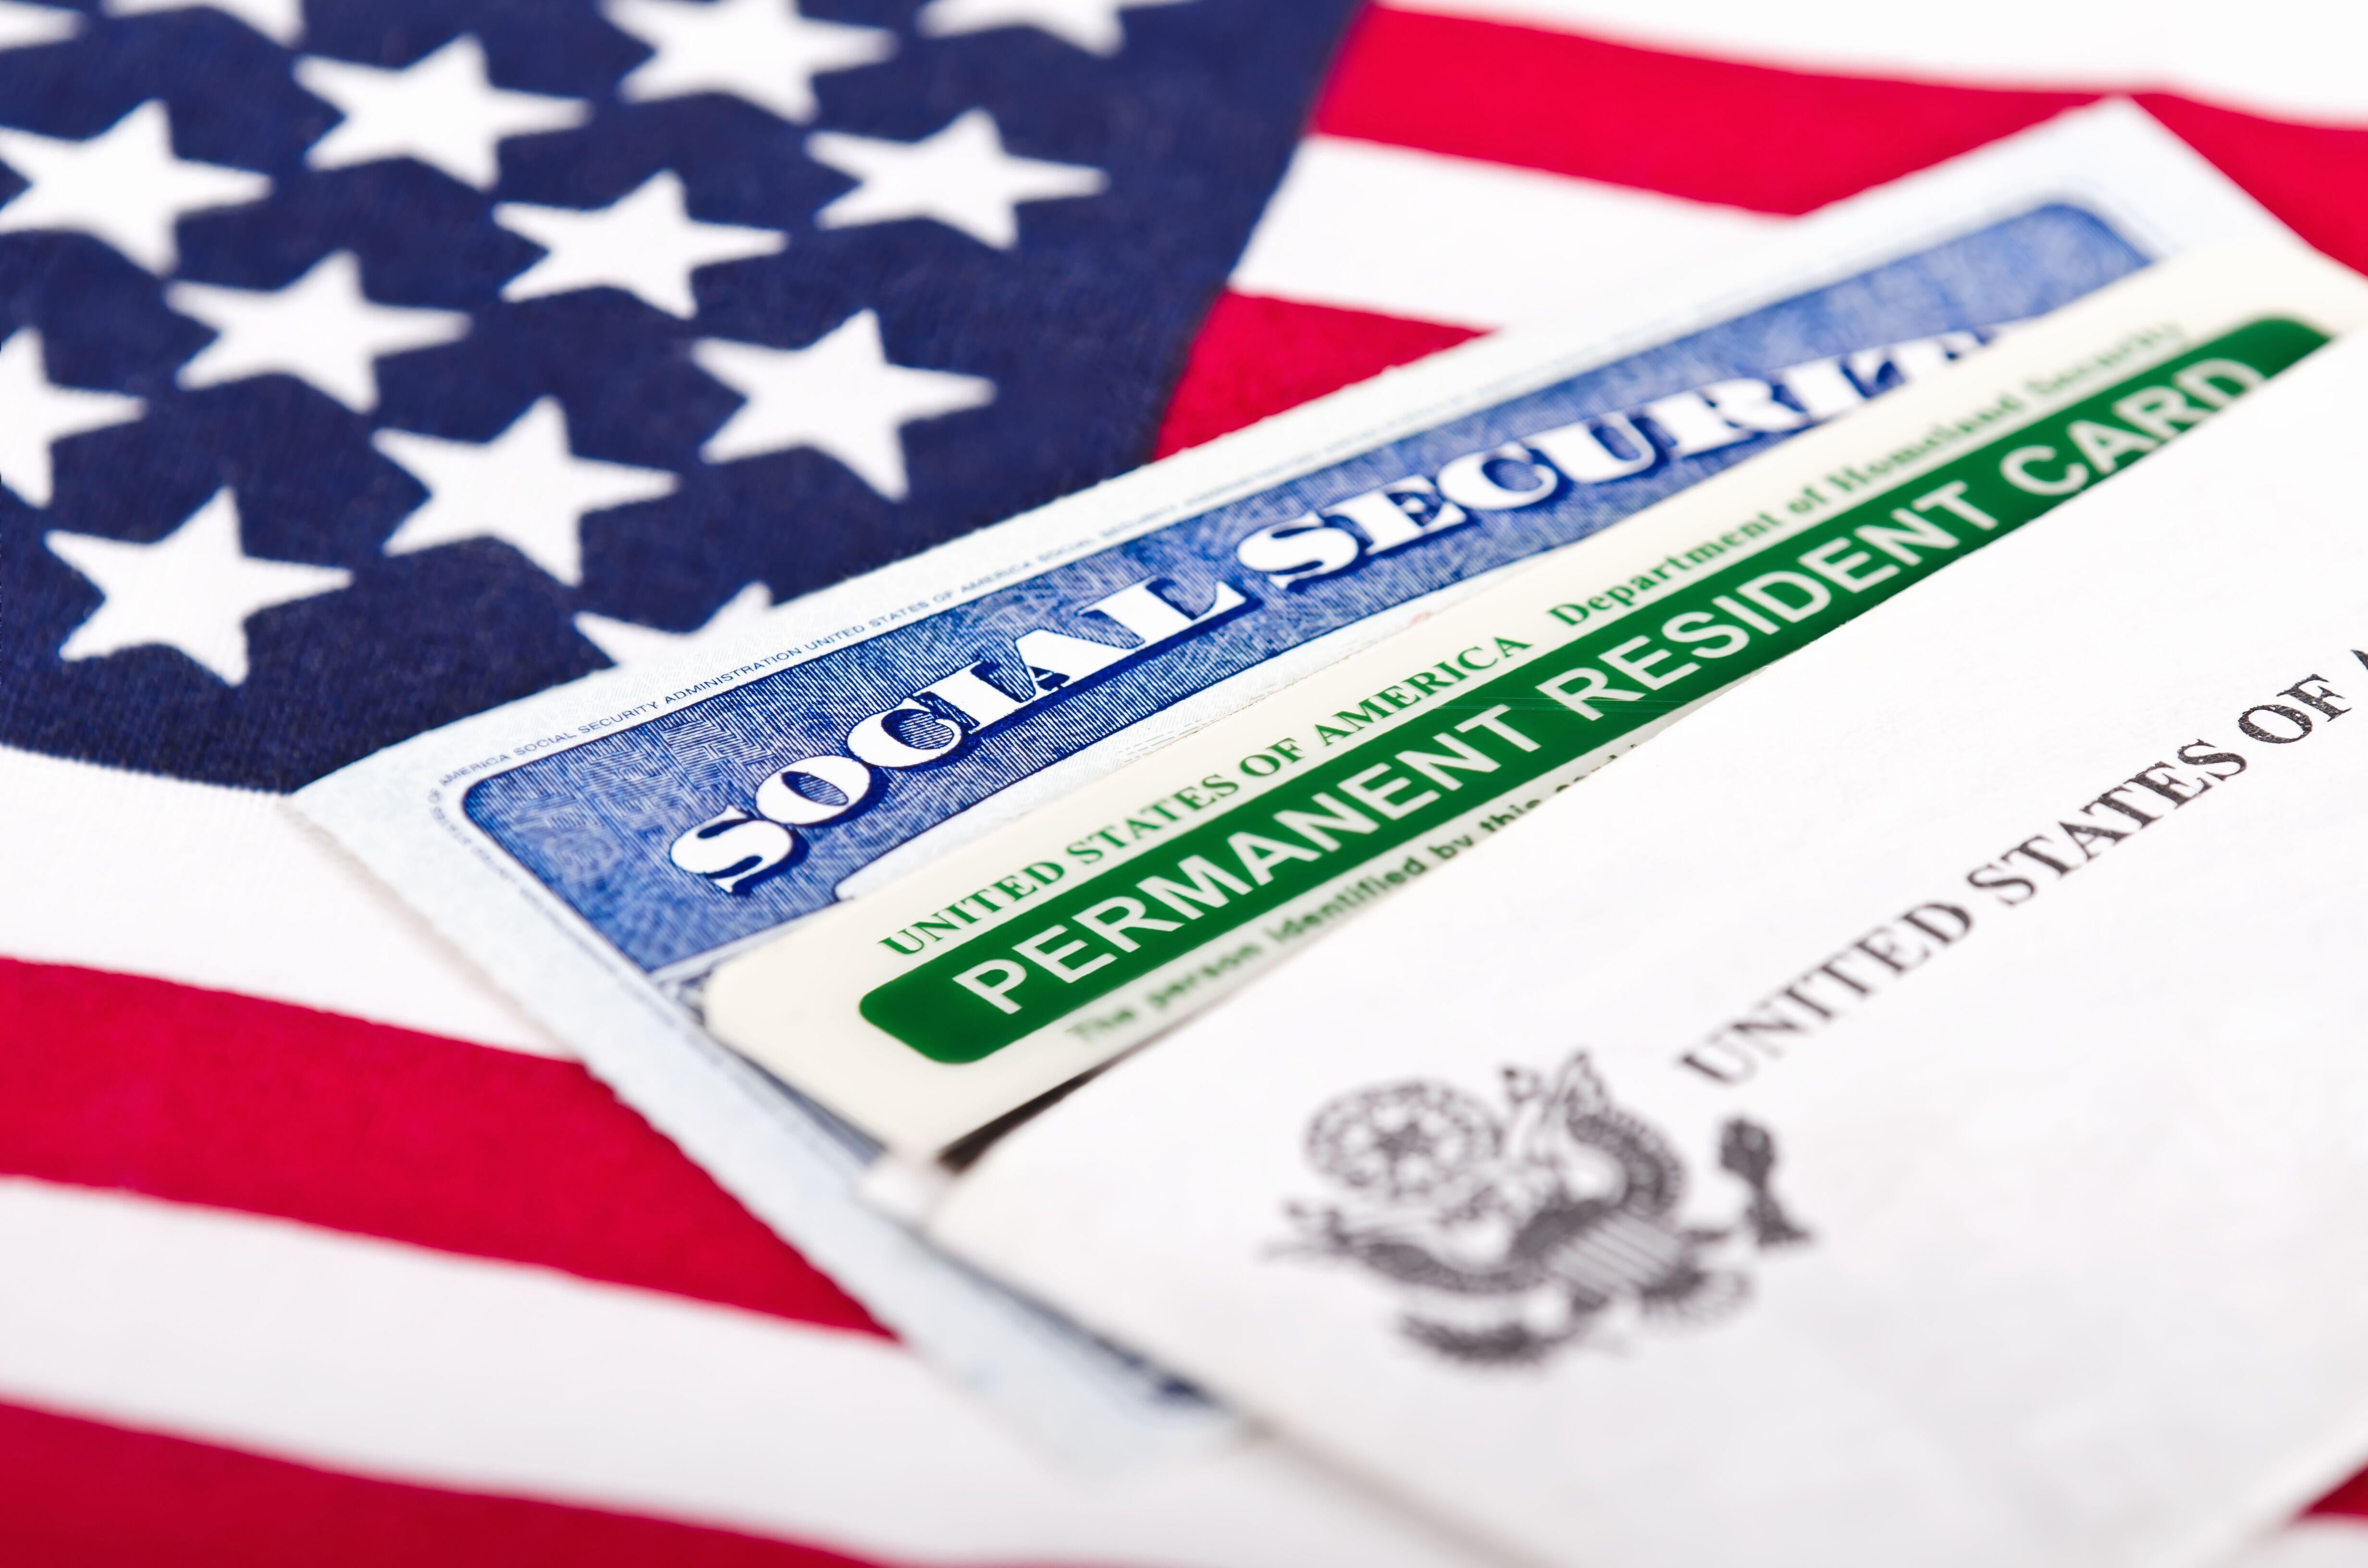 5cff7d16fffe78badf60ceeac4087e7c - Citizen Card Application Form Route 2